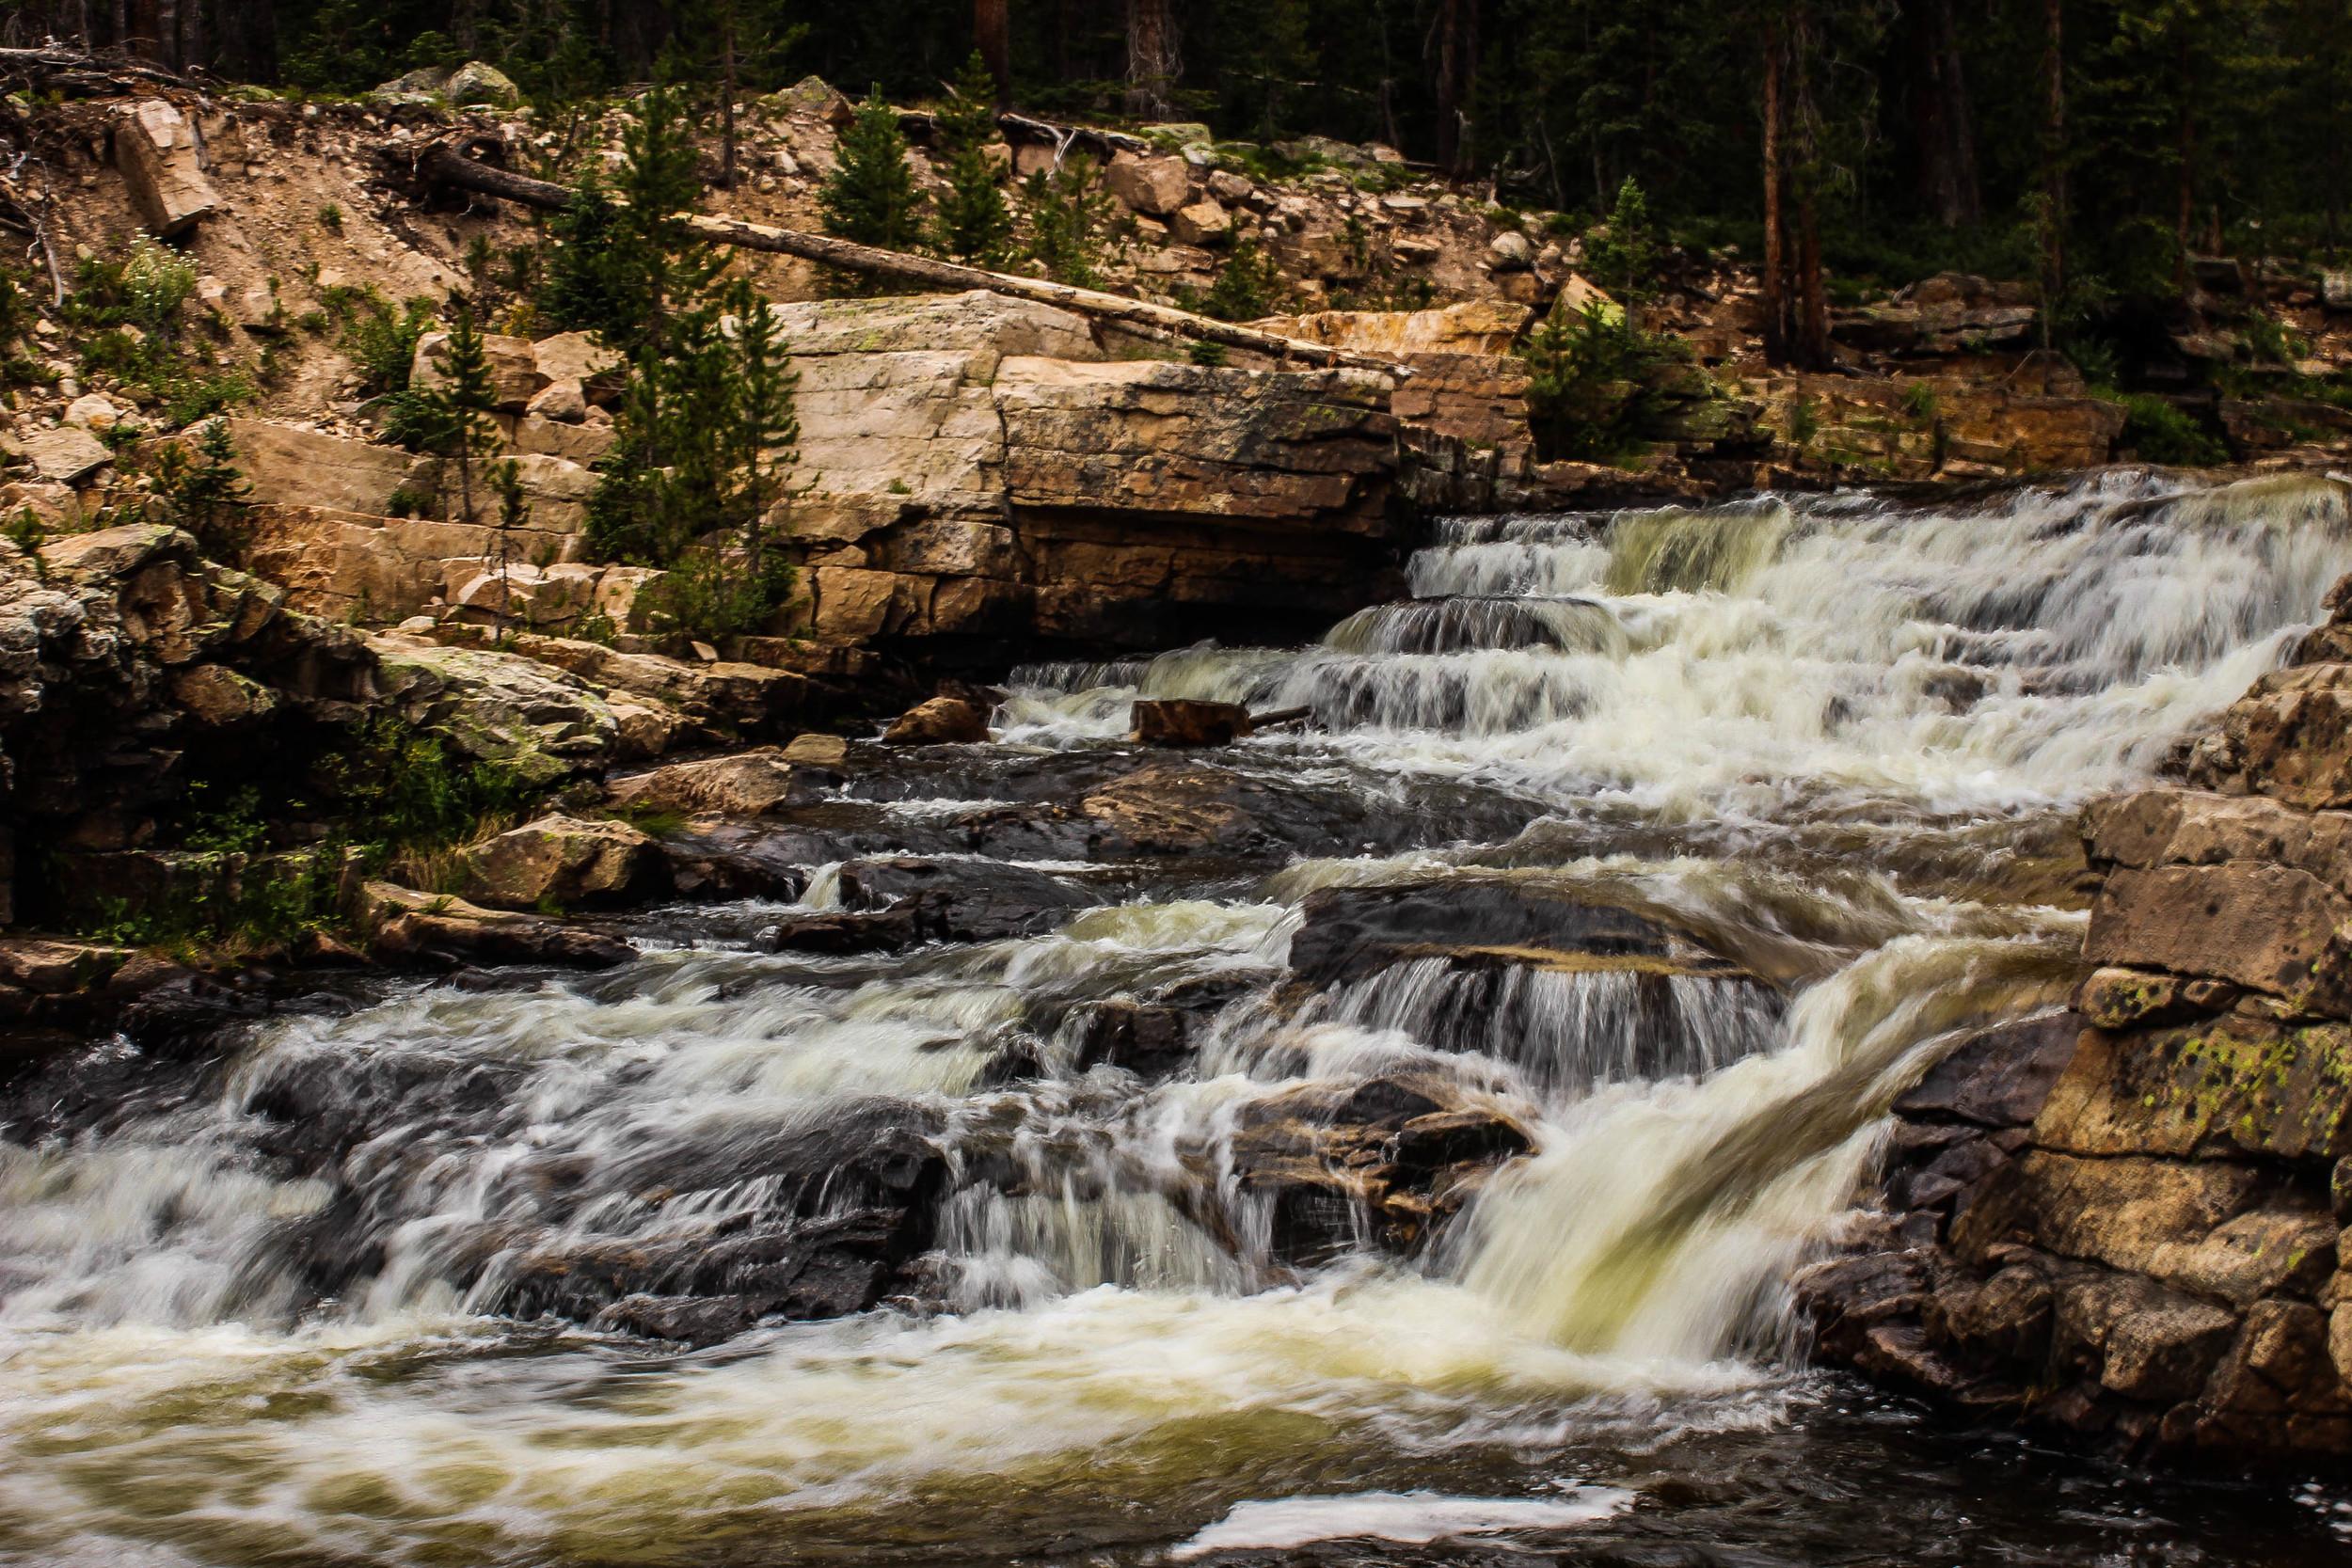 Provo River Falls: edited using the JamesB 'Summer at the Lake' lightroom preset